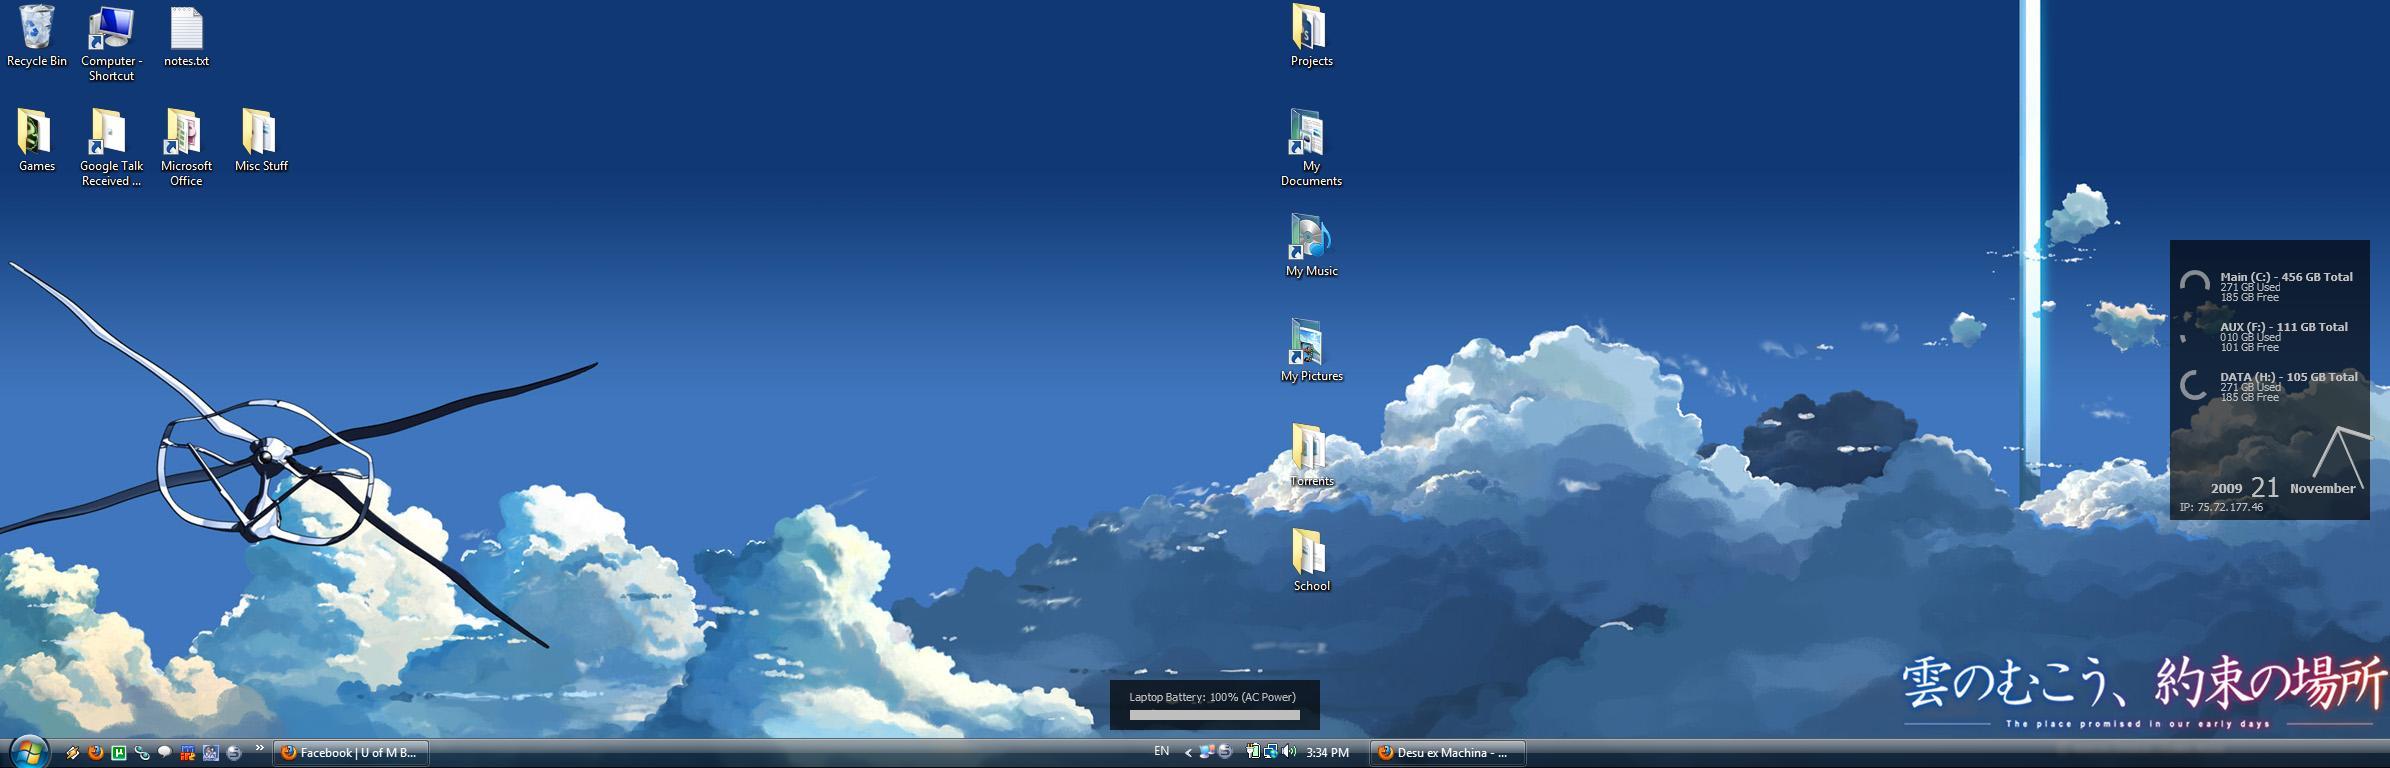 httpwwwsmscscomphotodual monitor wallpaper windows 717html 2390x768